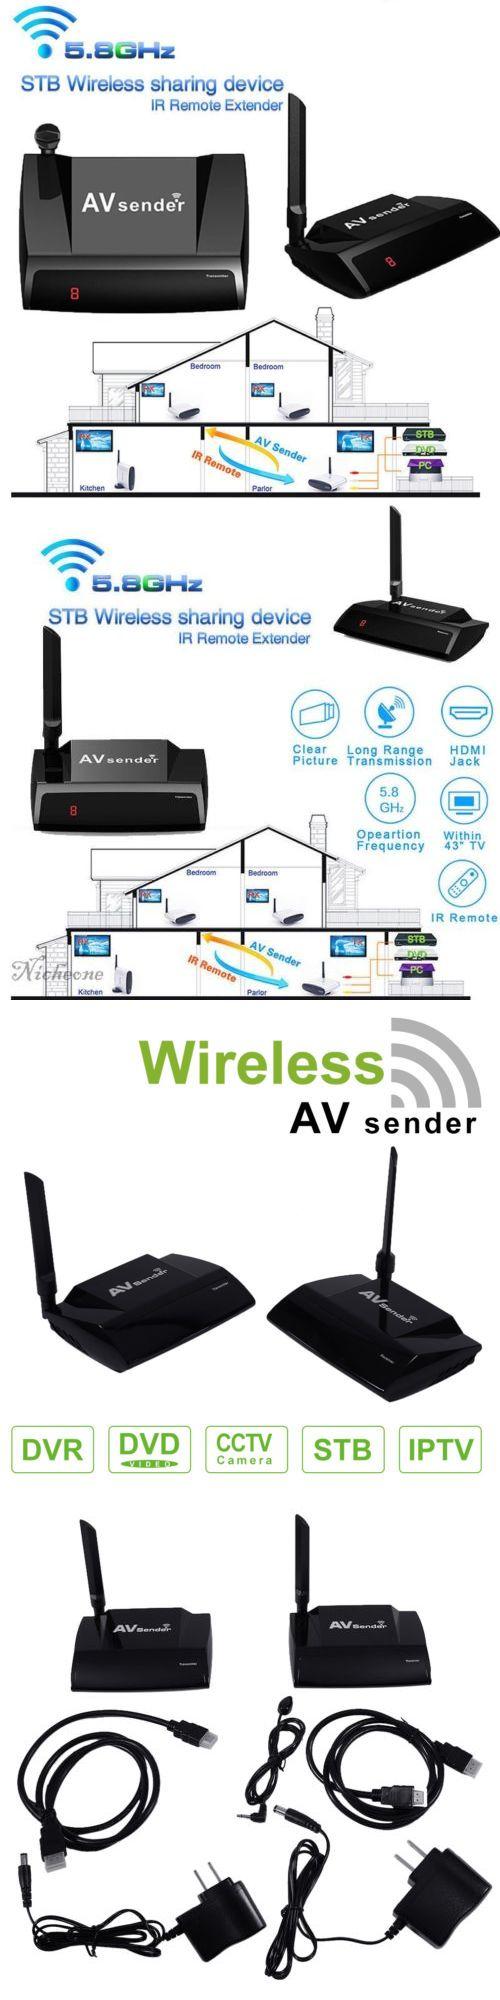 Audio Video Transmitters: 5.8Ghz 300M Hdmi 1080P Av Sender Tv Wireless Transmitter Receiver Audio Video Mu -> BUY IT NOW ONLY: $98.42 on eBay!